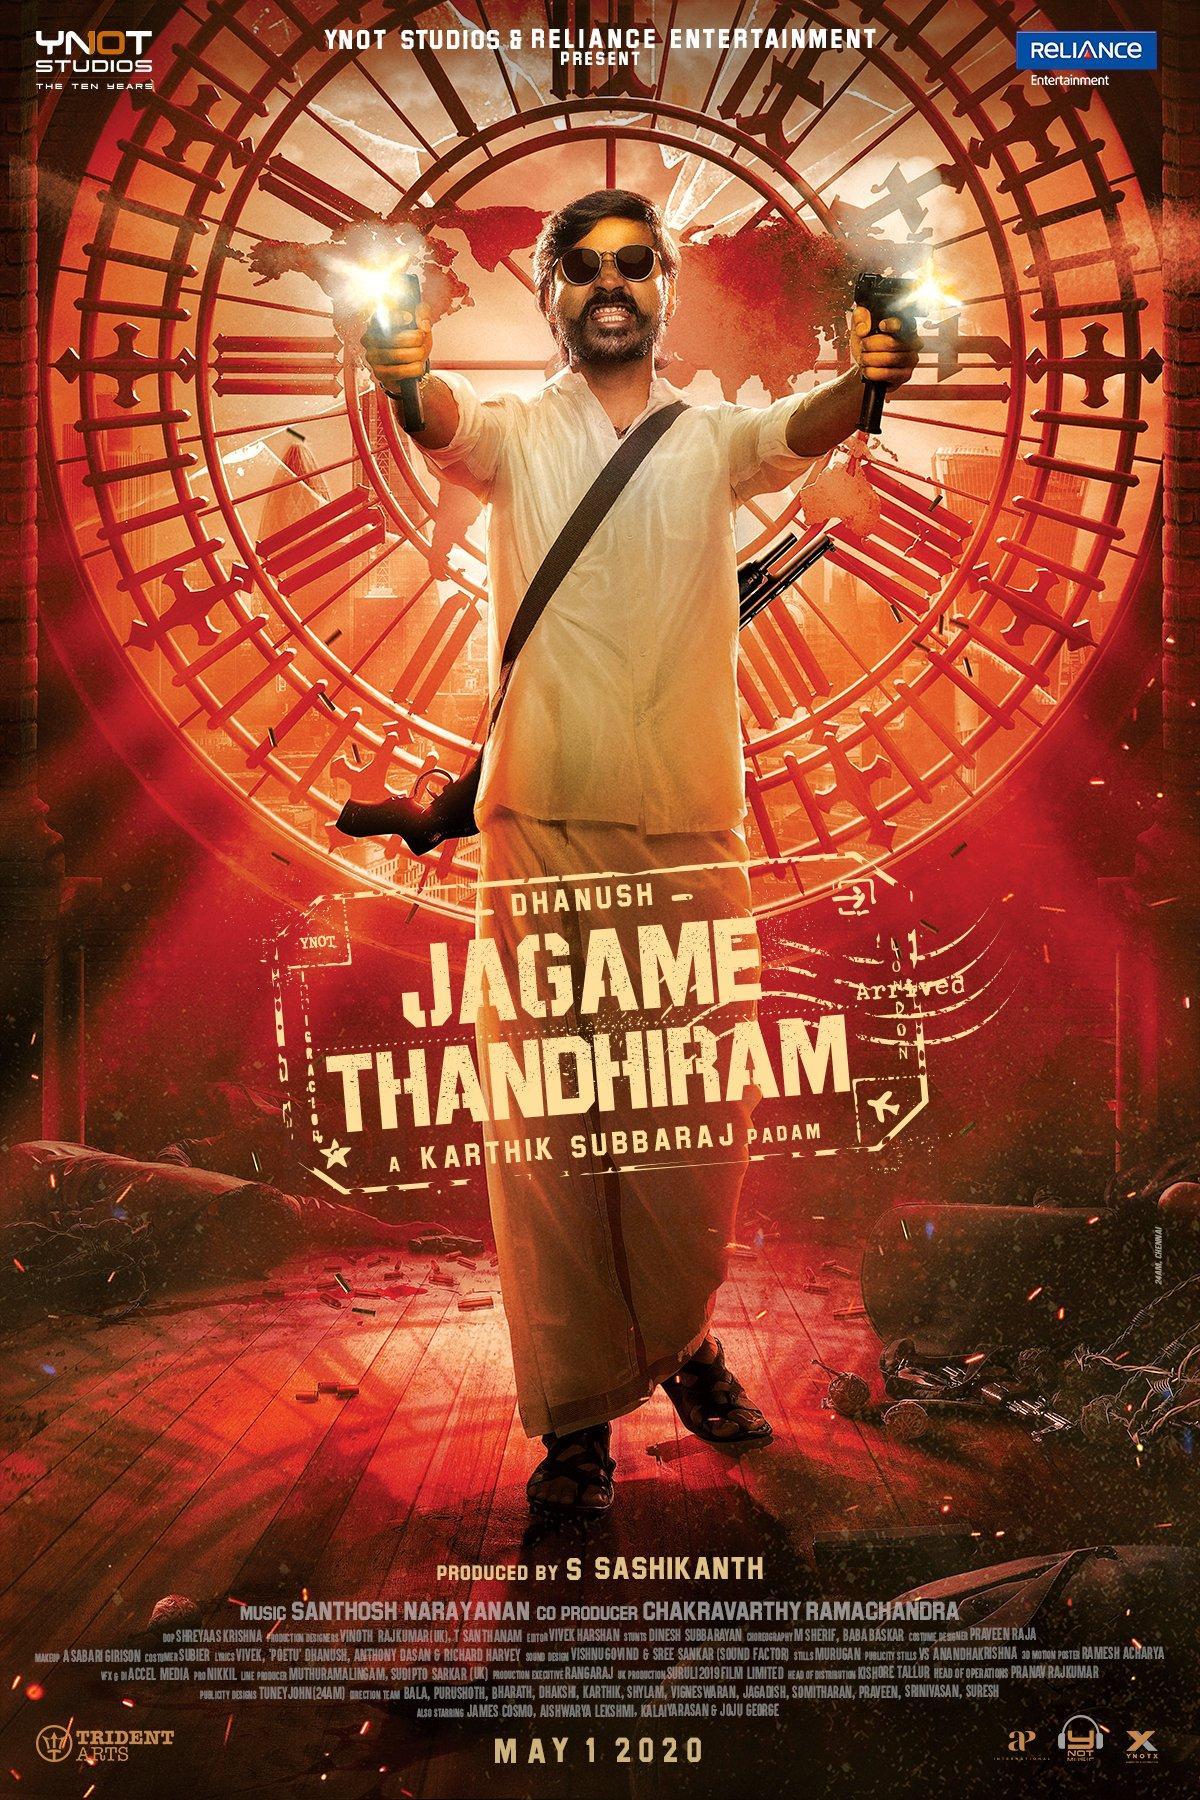 Jagame Thandhiram Picture Gallery